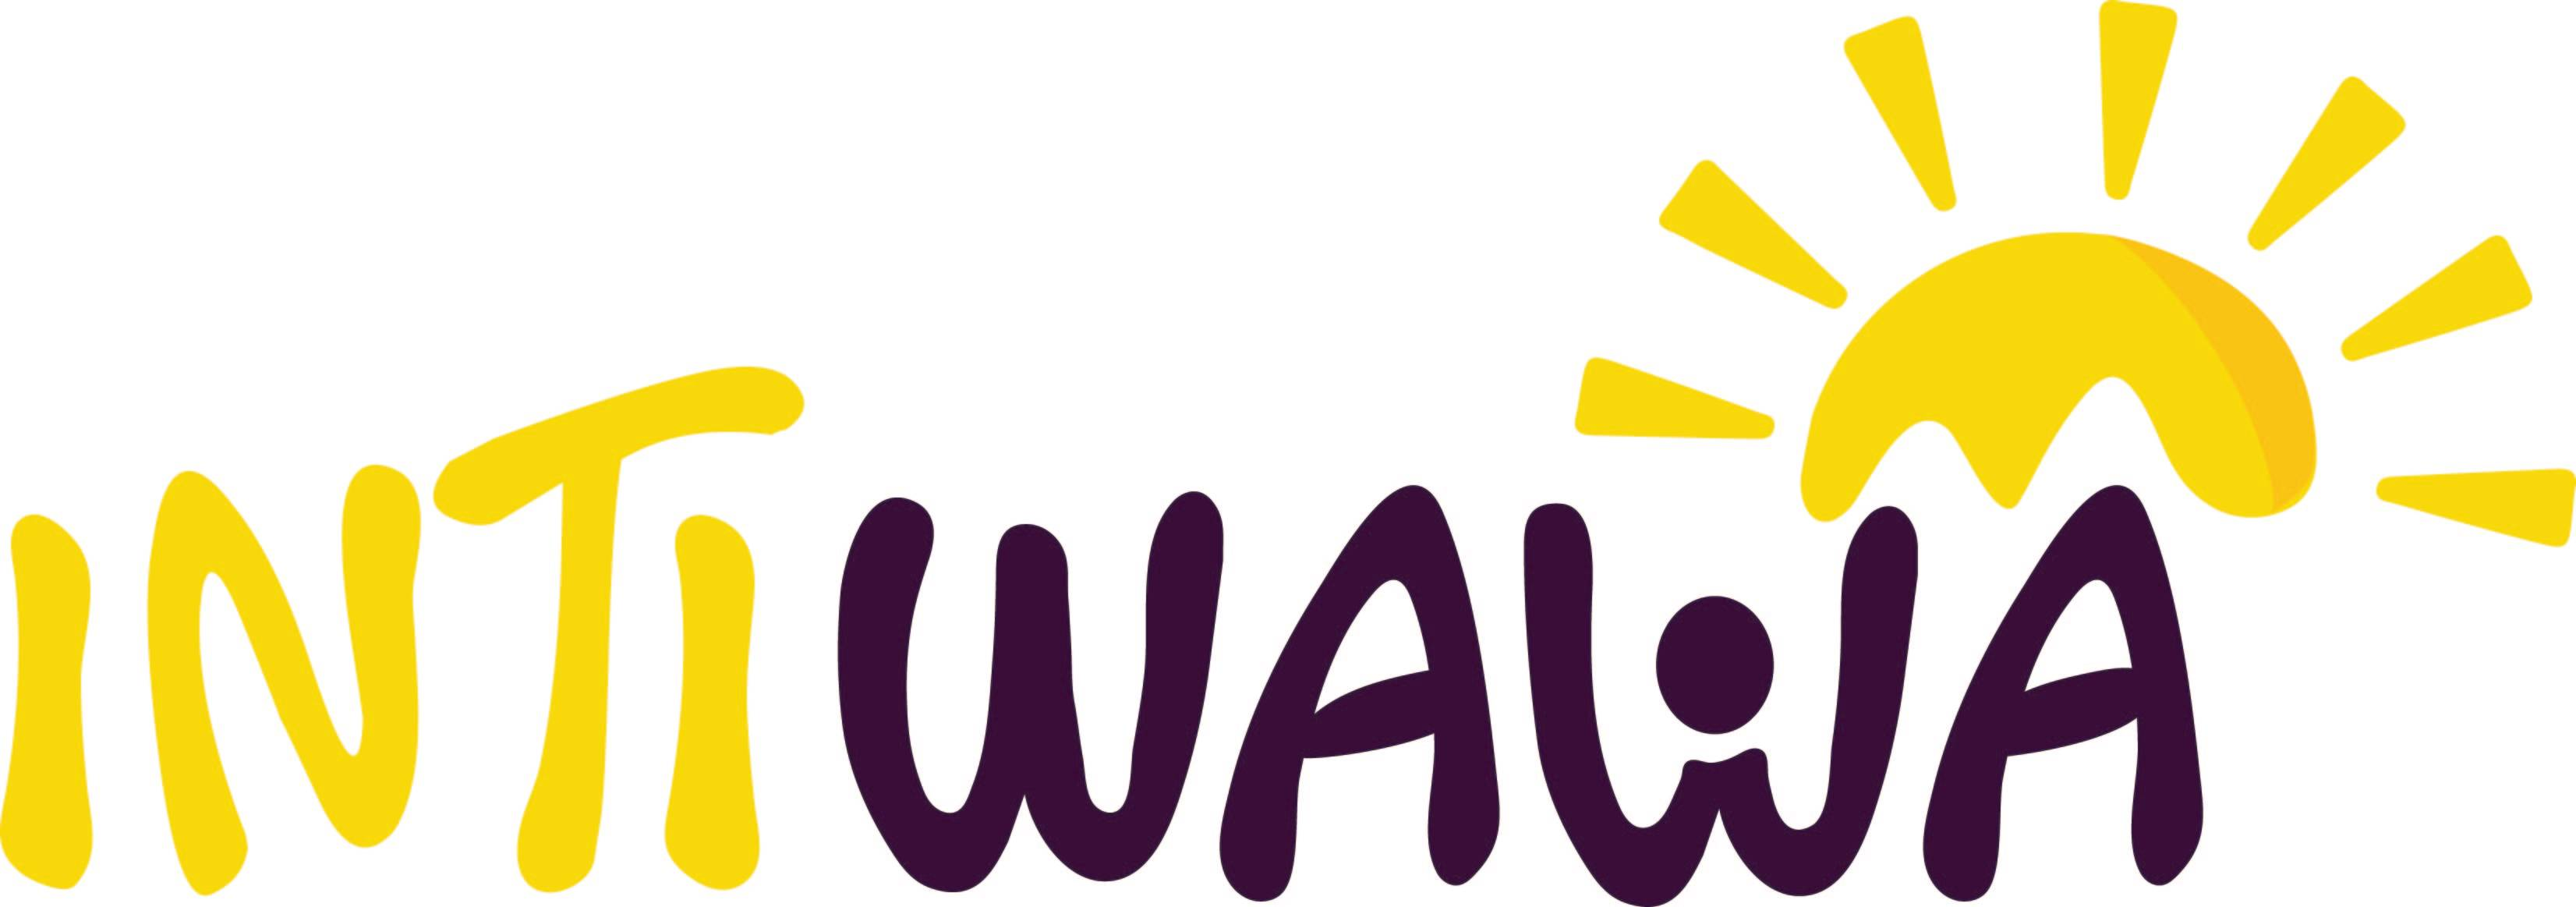 Logo of Intiwawa - Children of the Sun